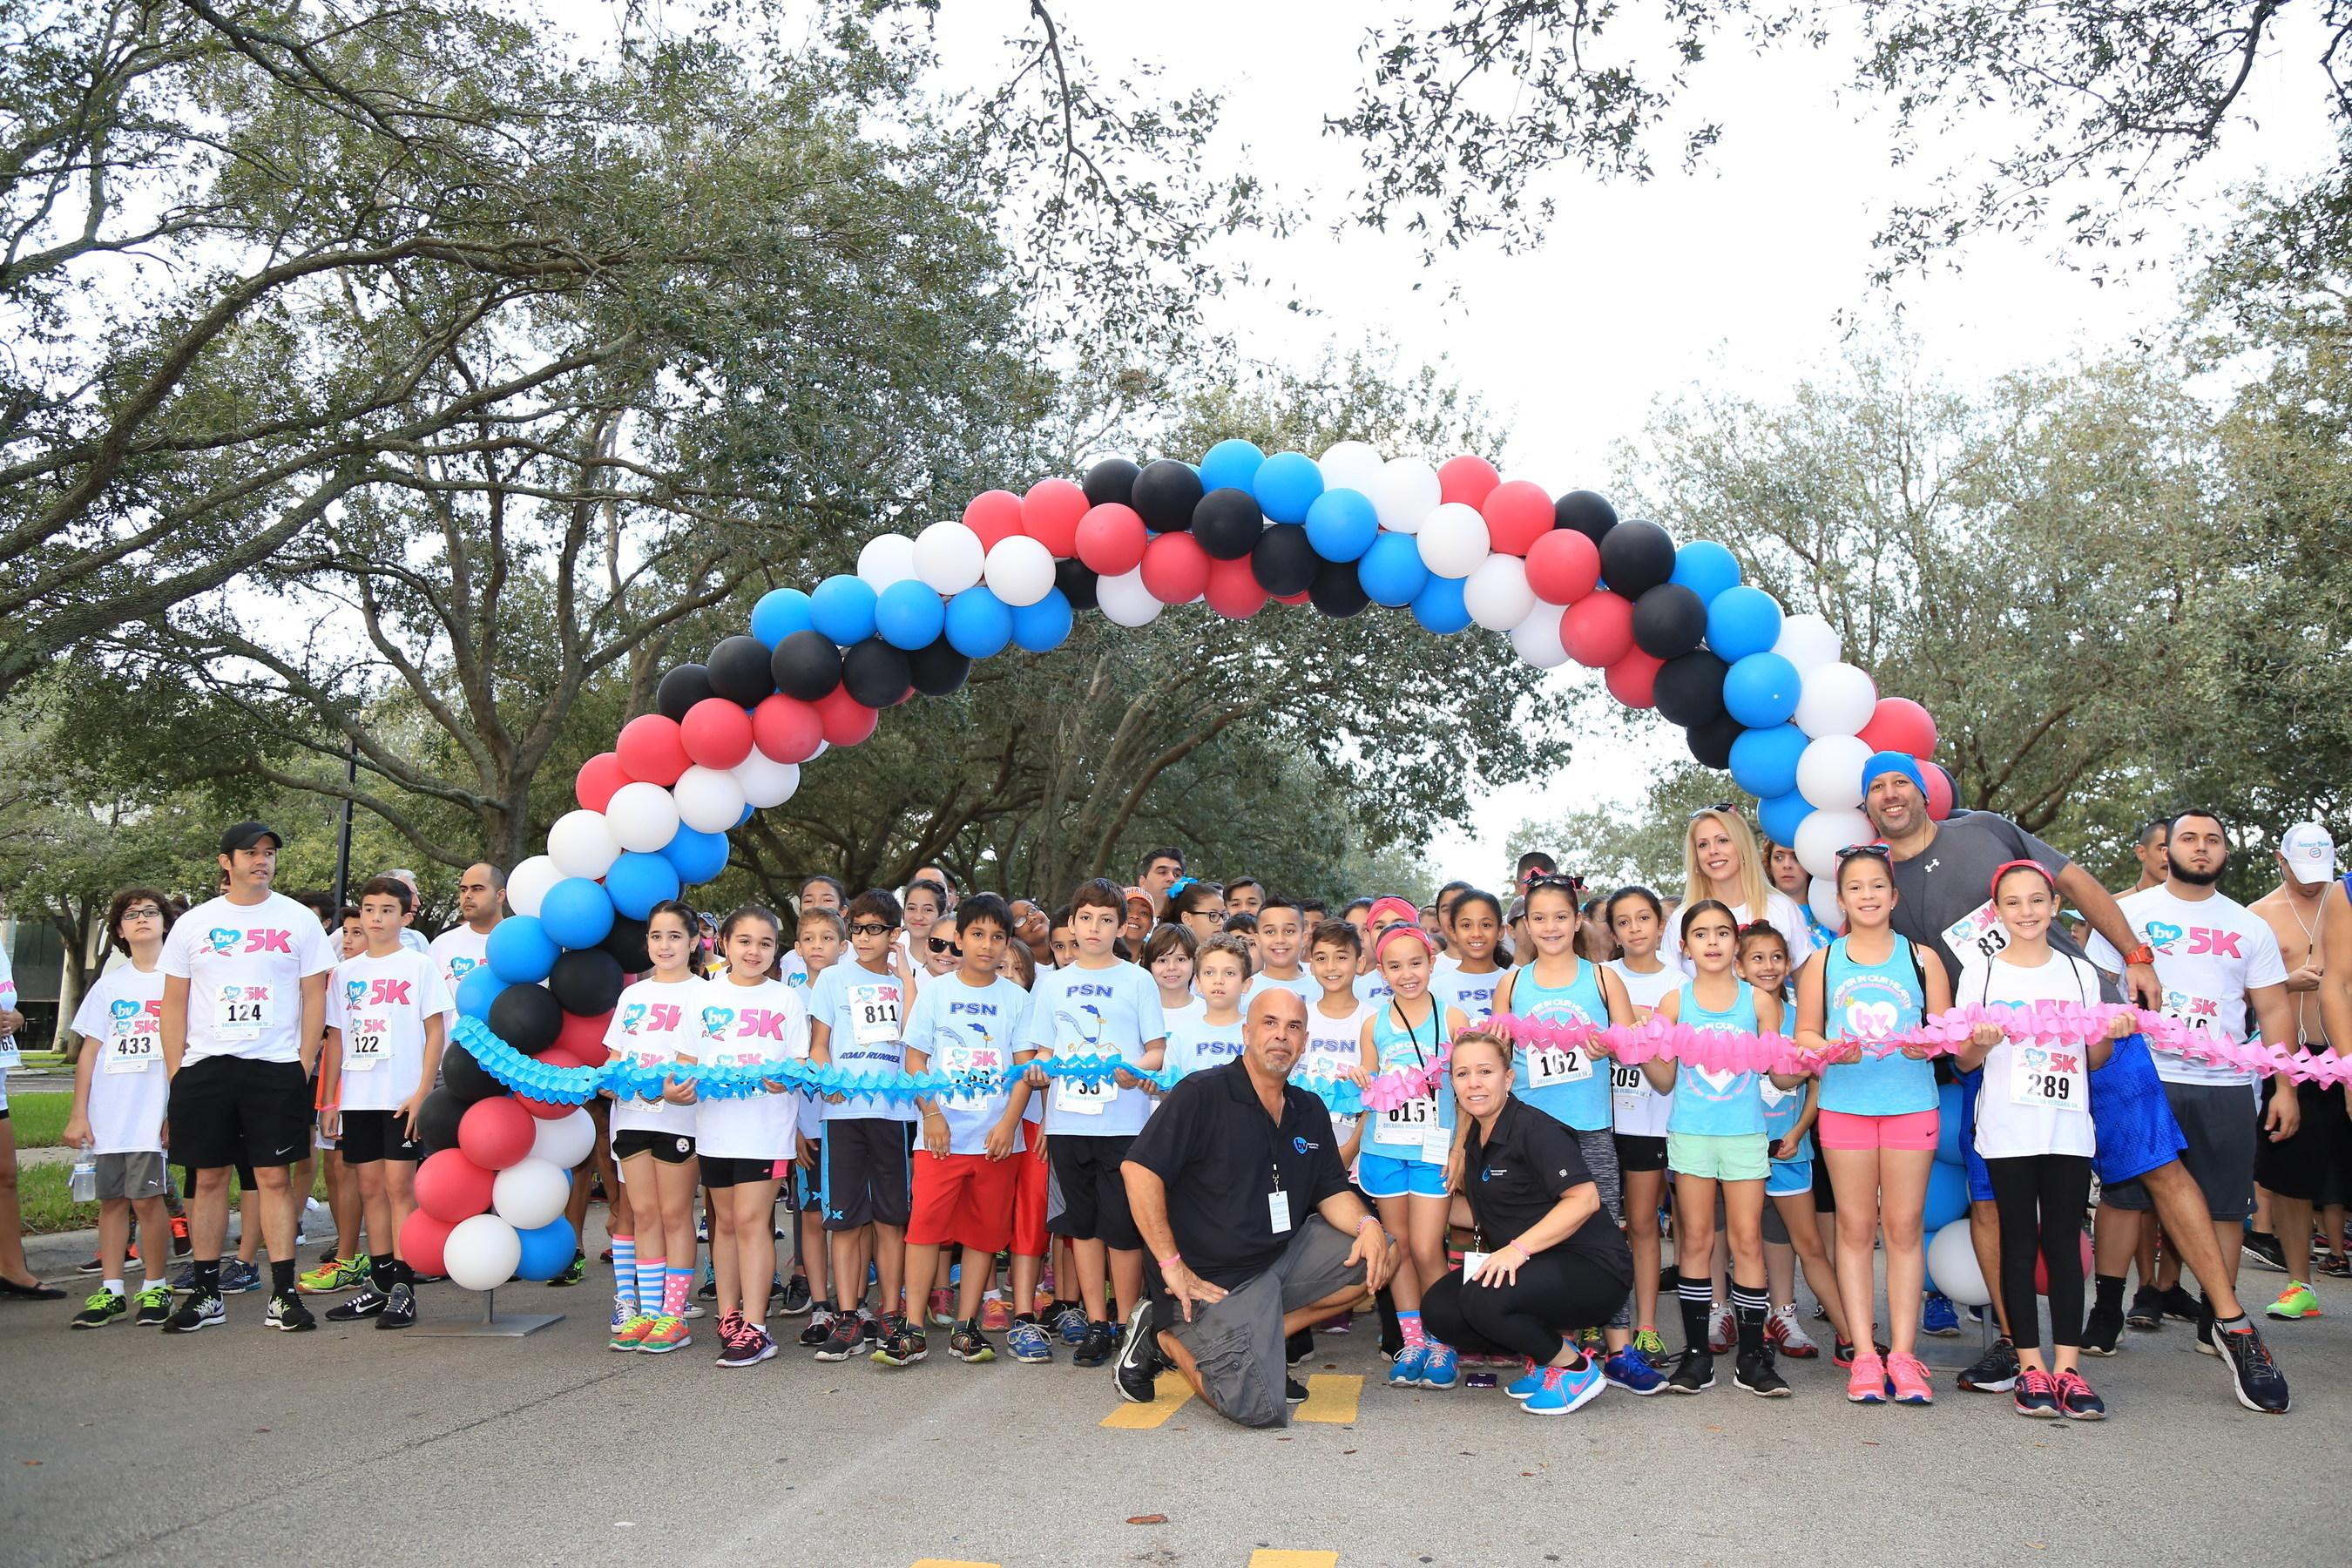 Breanna's parents, Jesus and Claudia Vergara, with race participants at the Breanna Vergara 5K & Color Run.